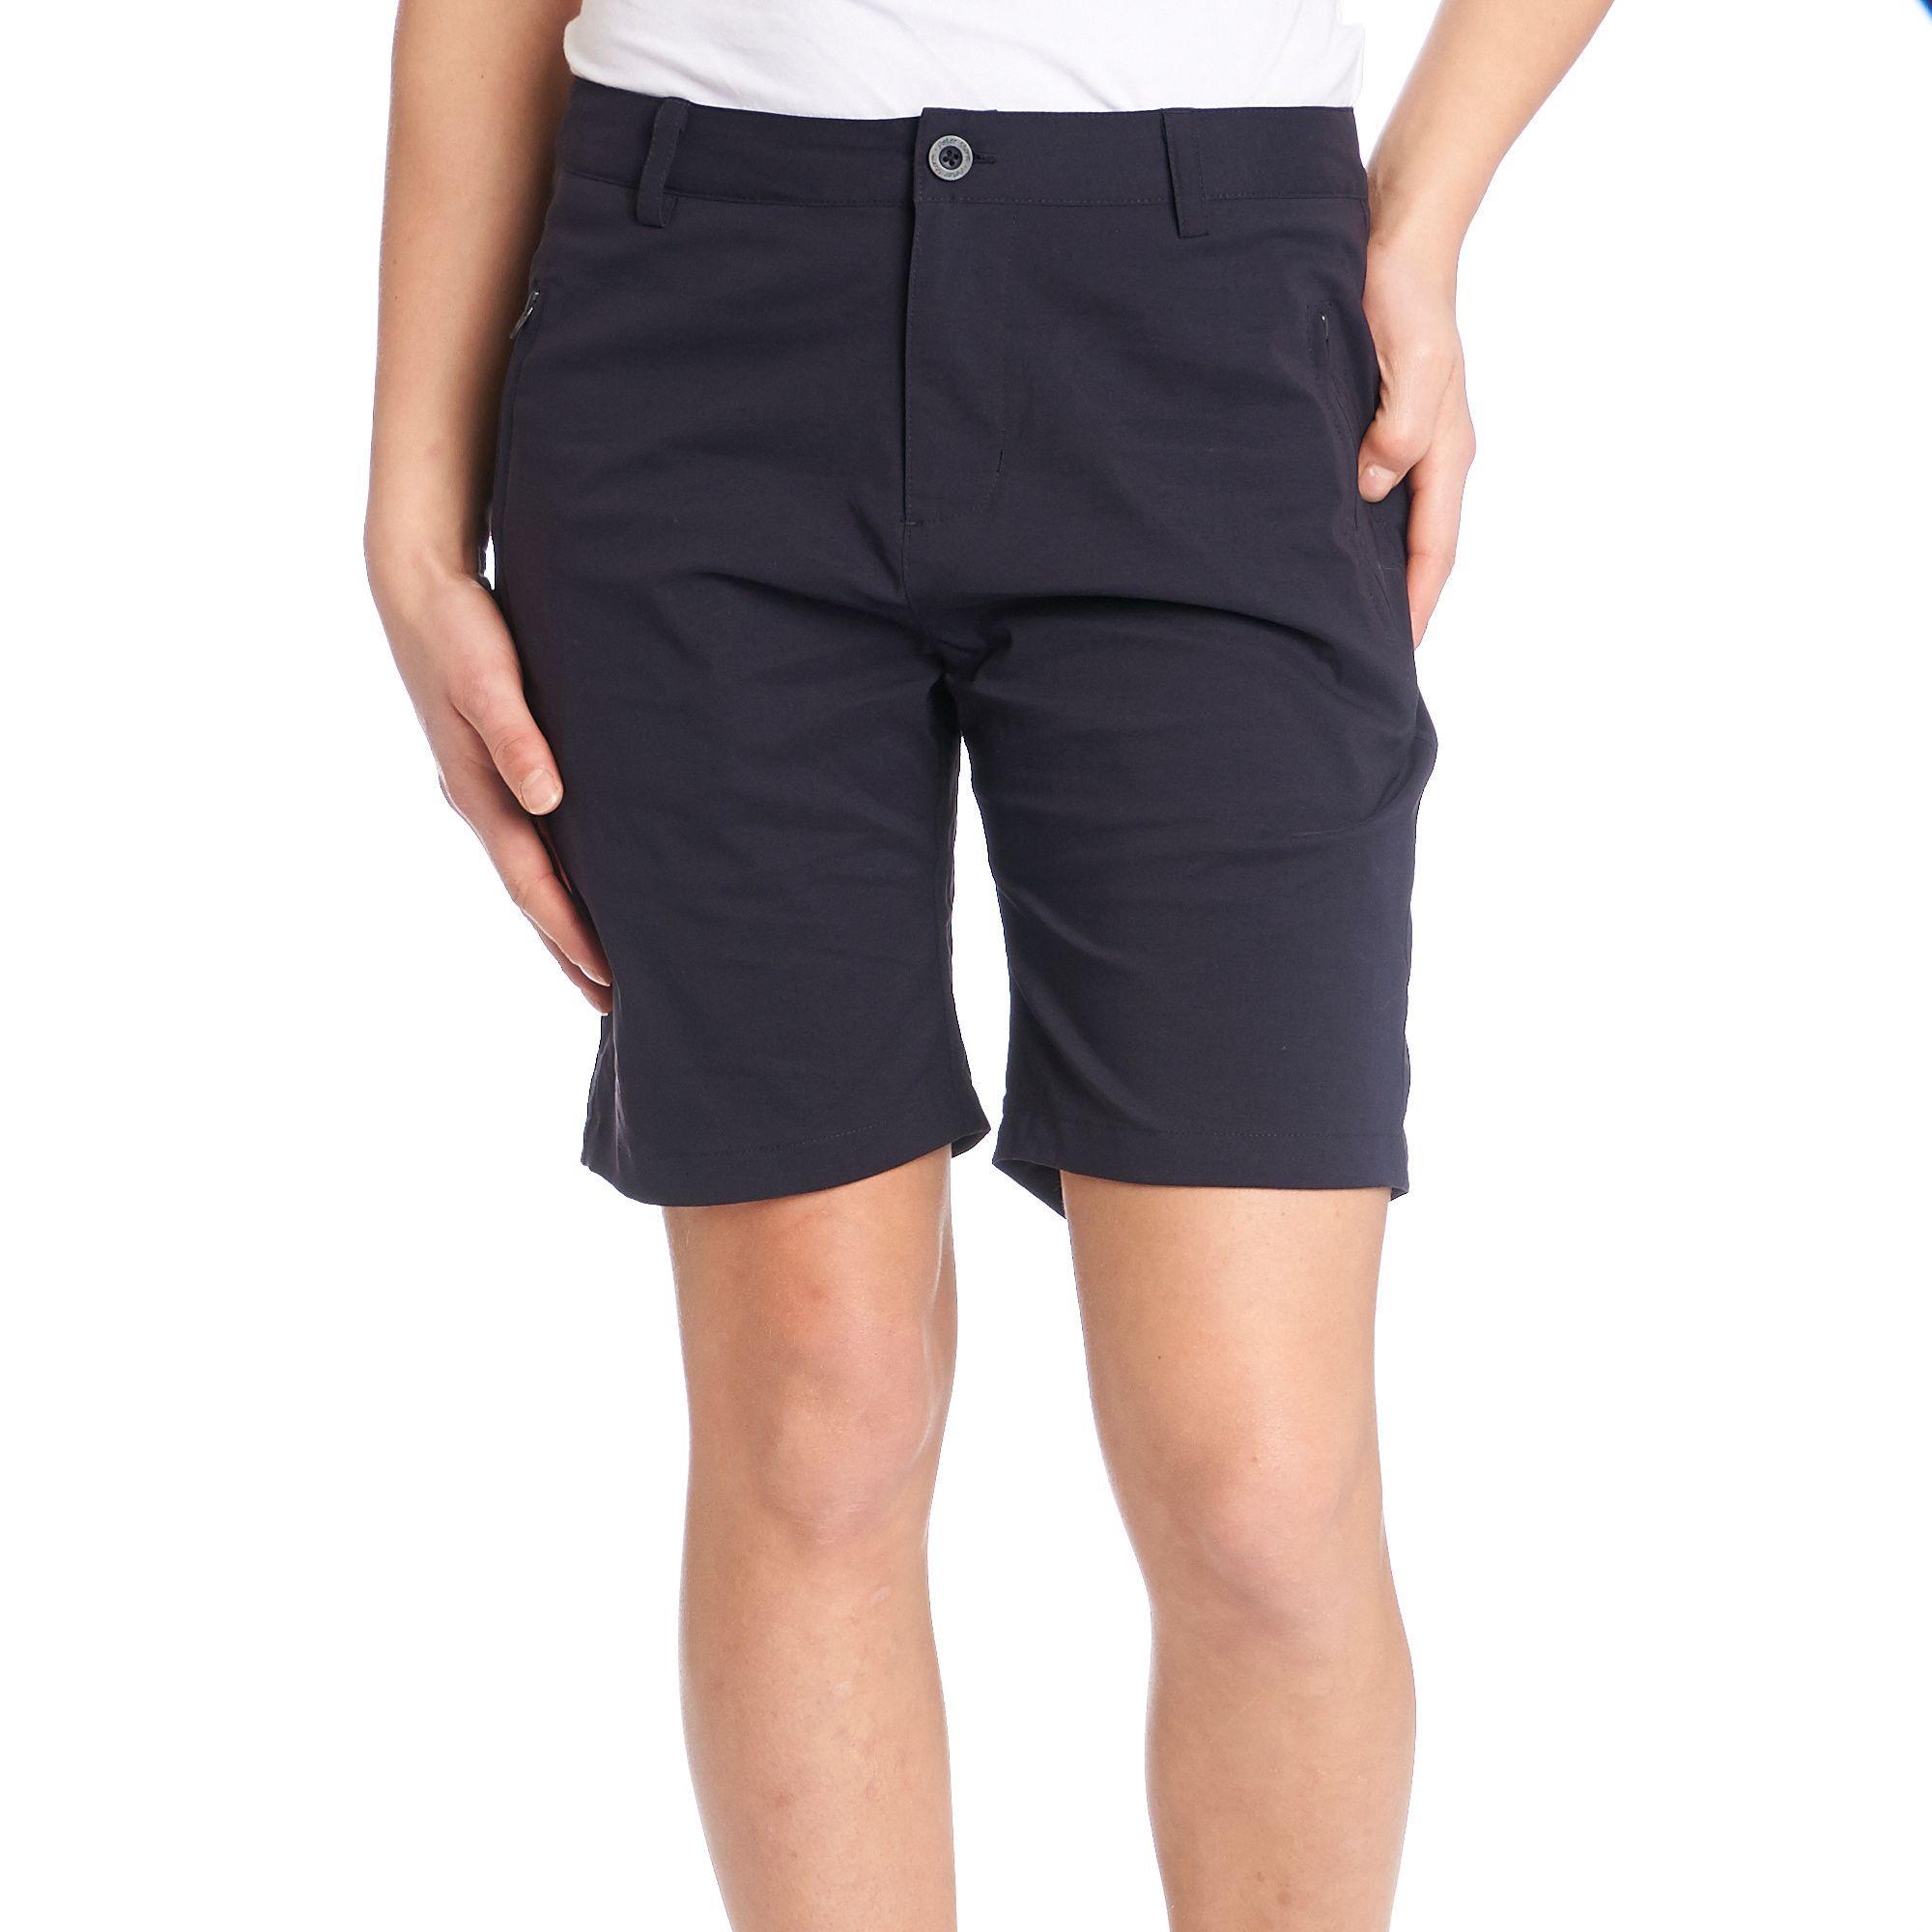 PETER STORM Women's Stretch Shorts